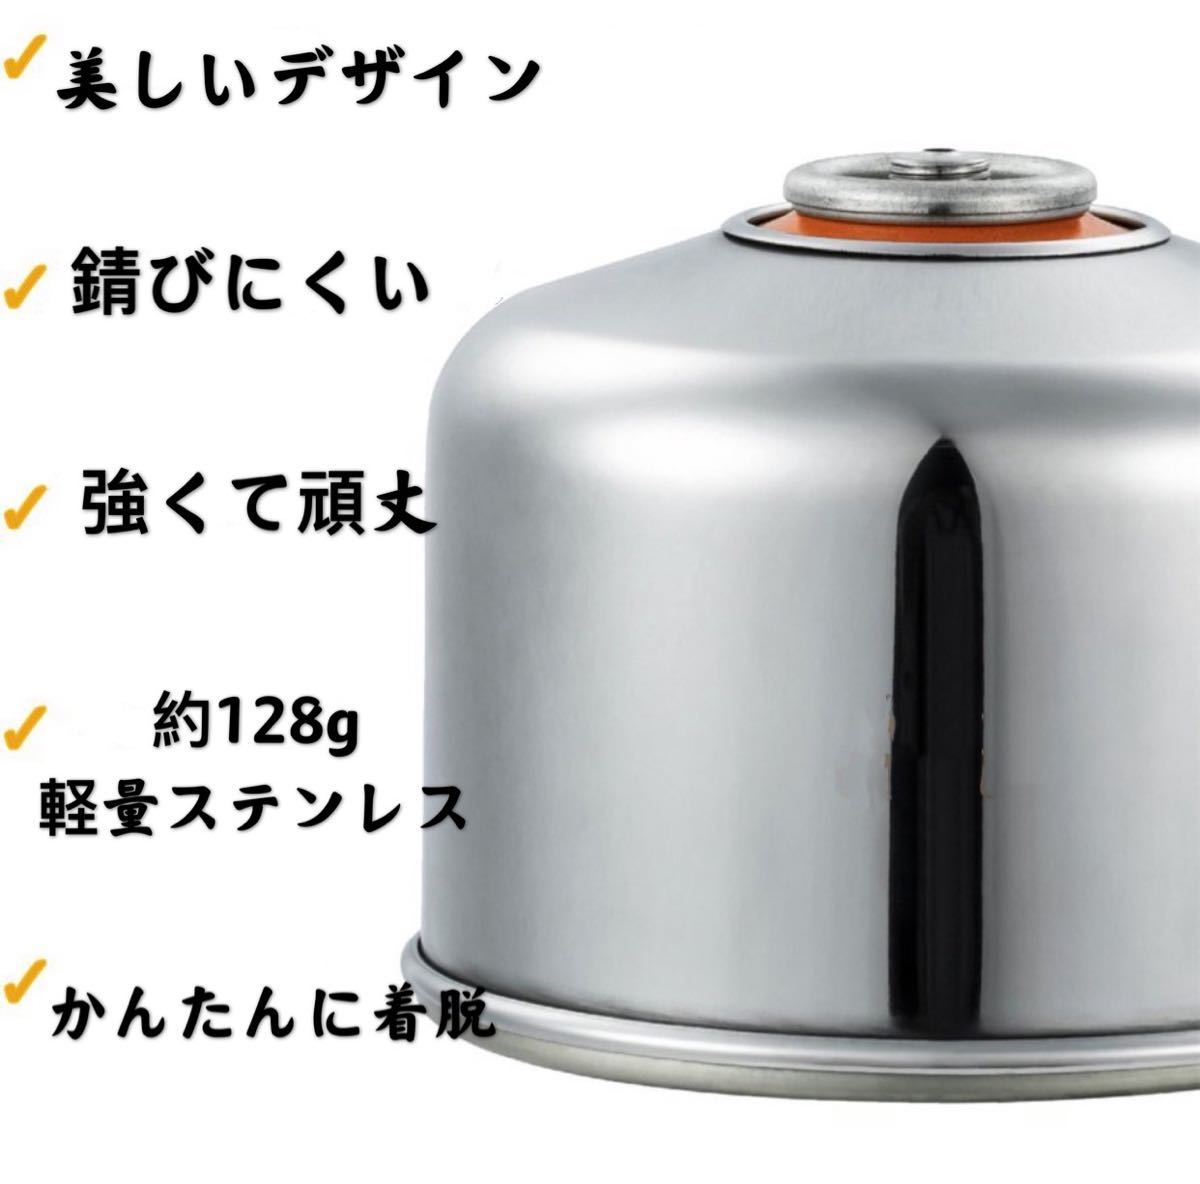 OD缶カバー 金属カバー 鏡面仕上げ 色ゴールド 250用ランタン ガス缶カバー